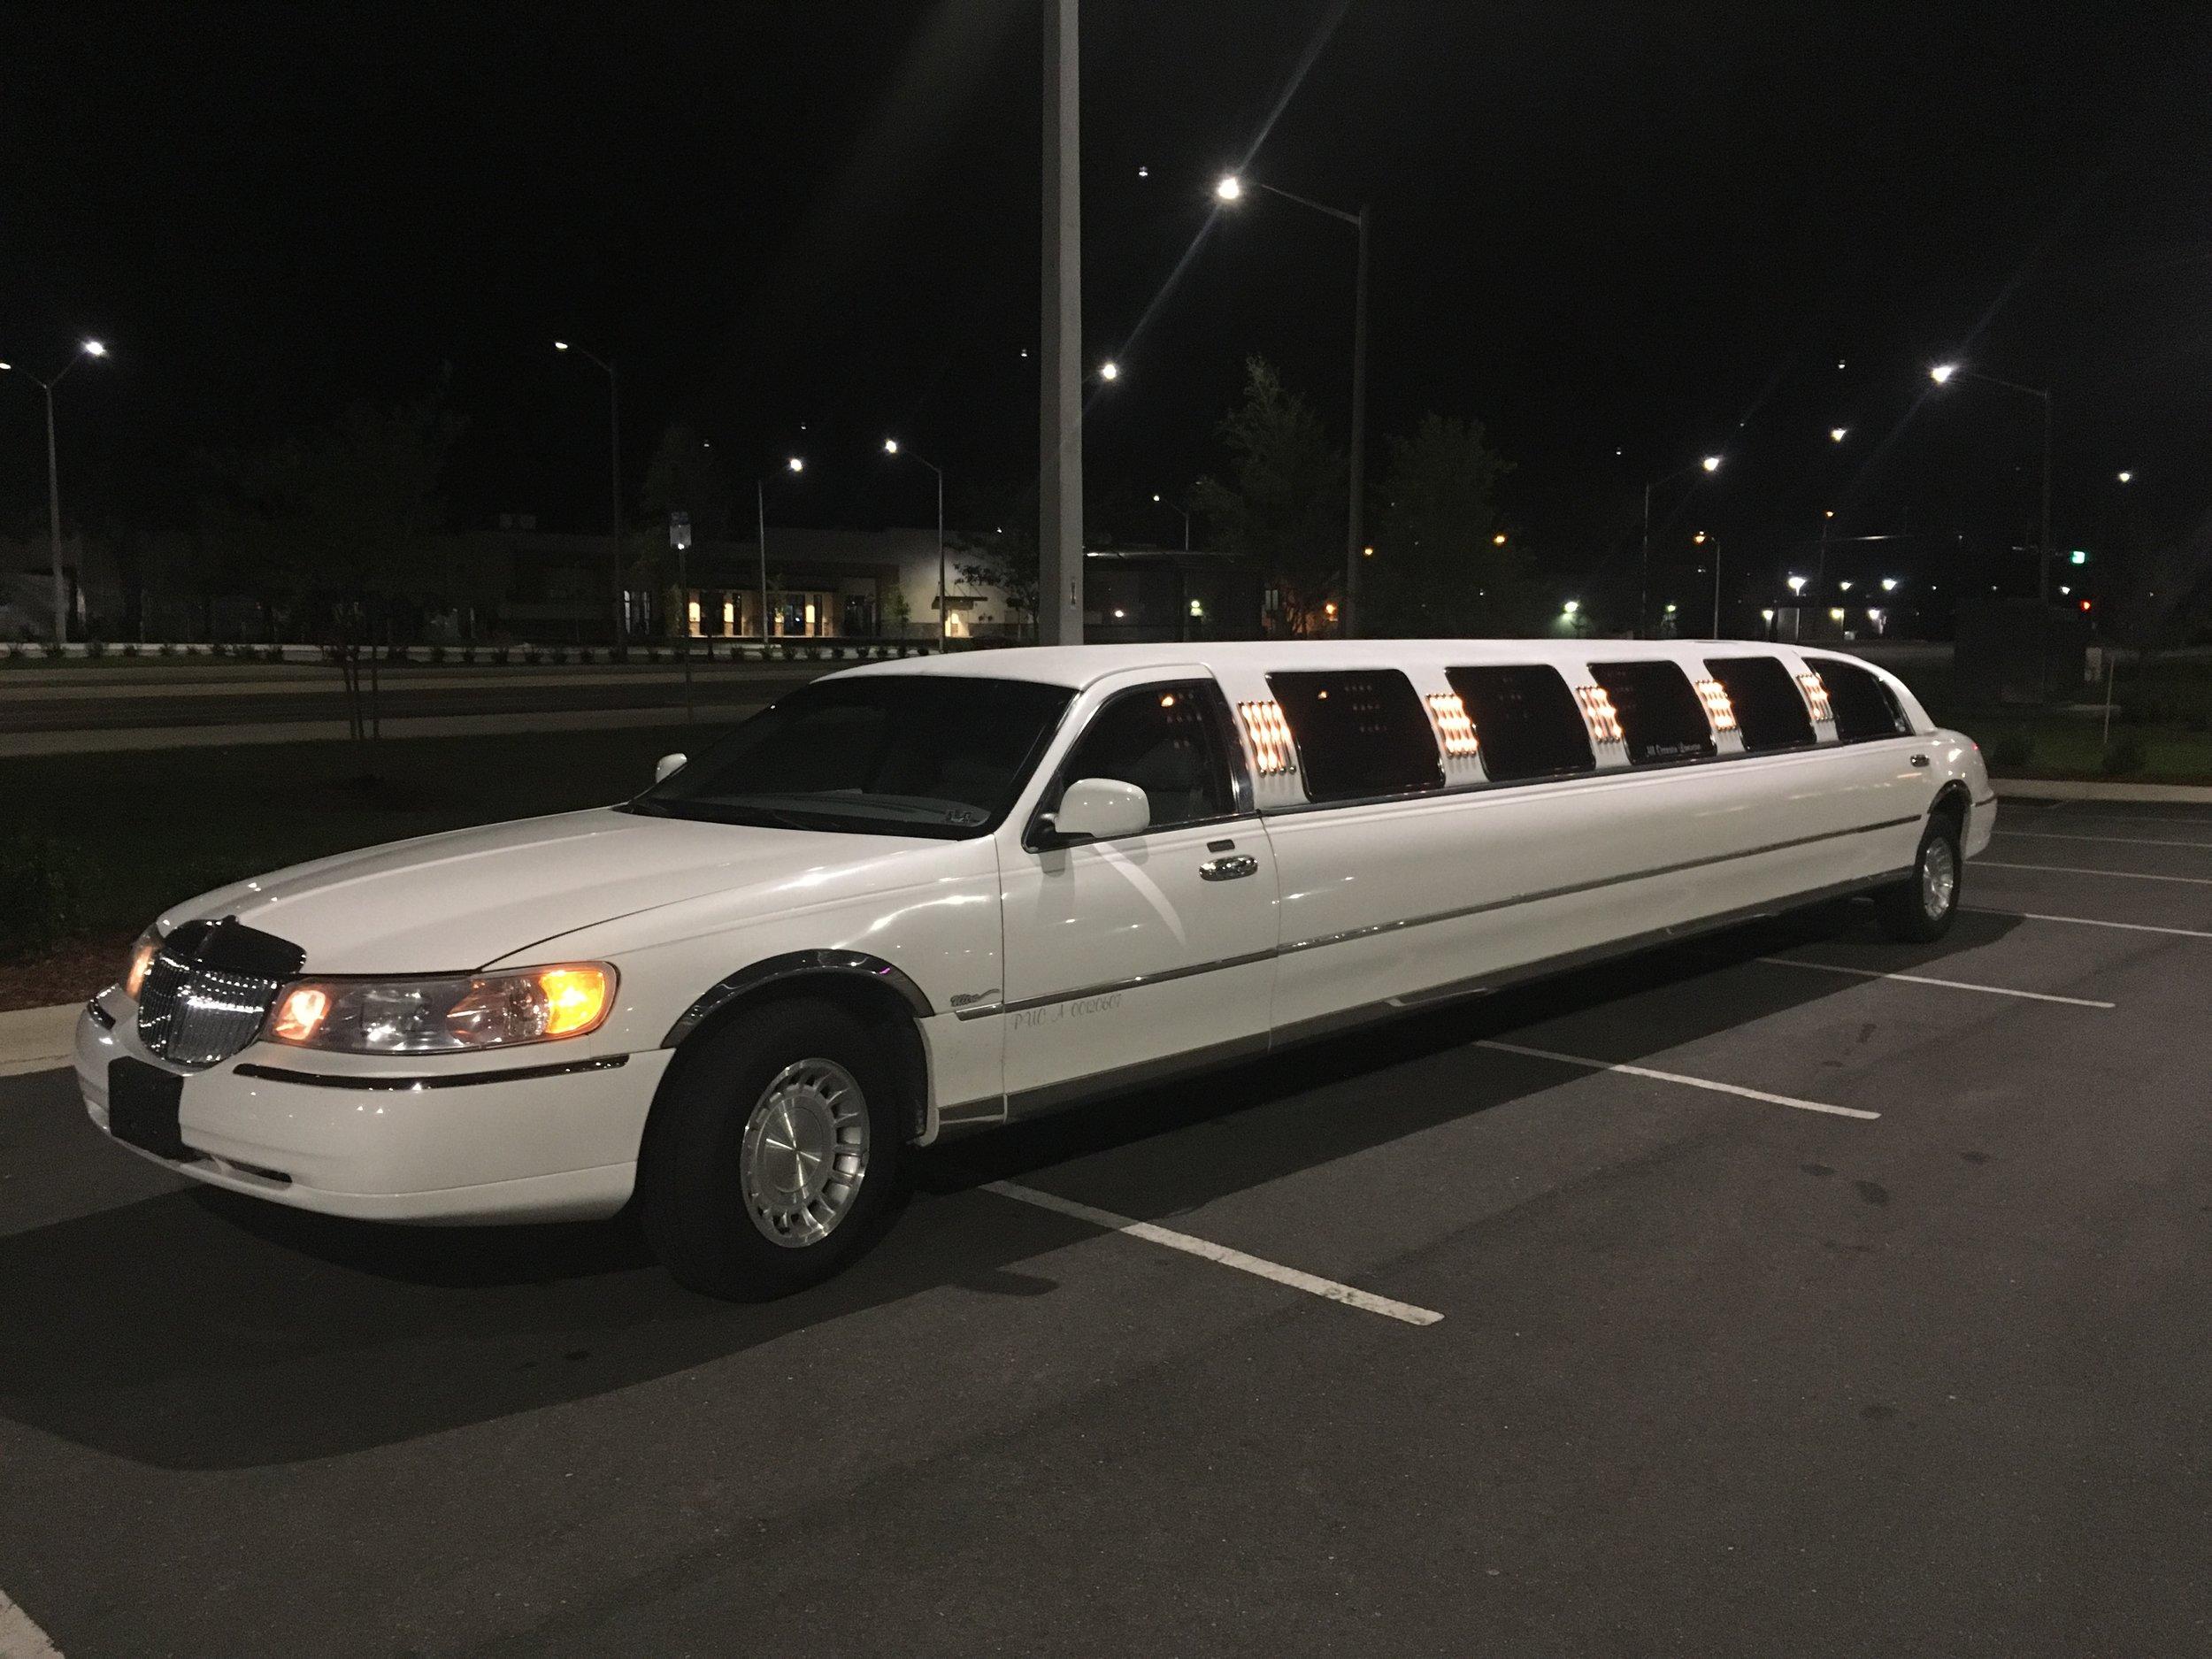 FTS Limousine - Tanzanite Exterior